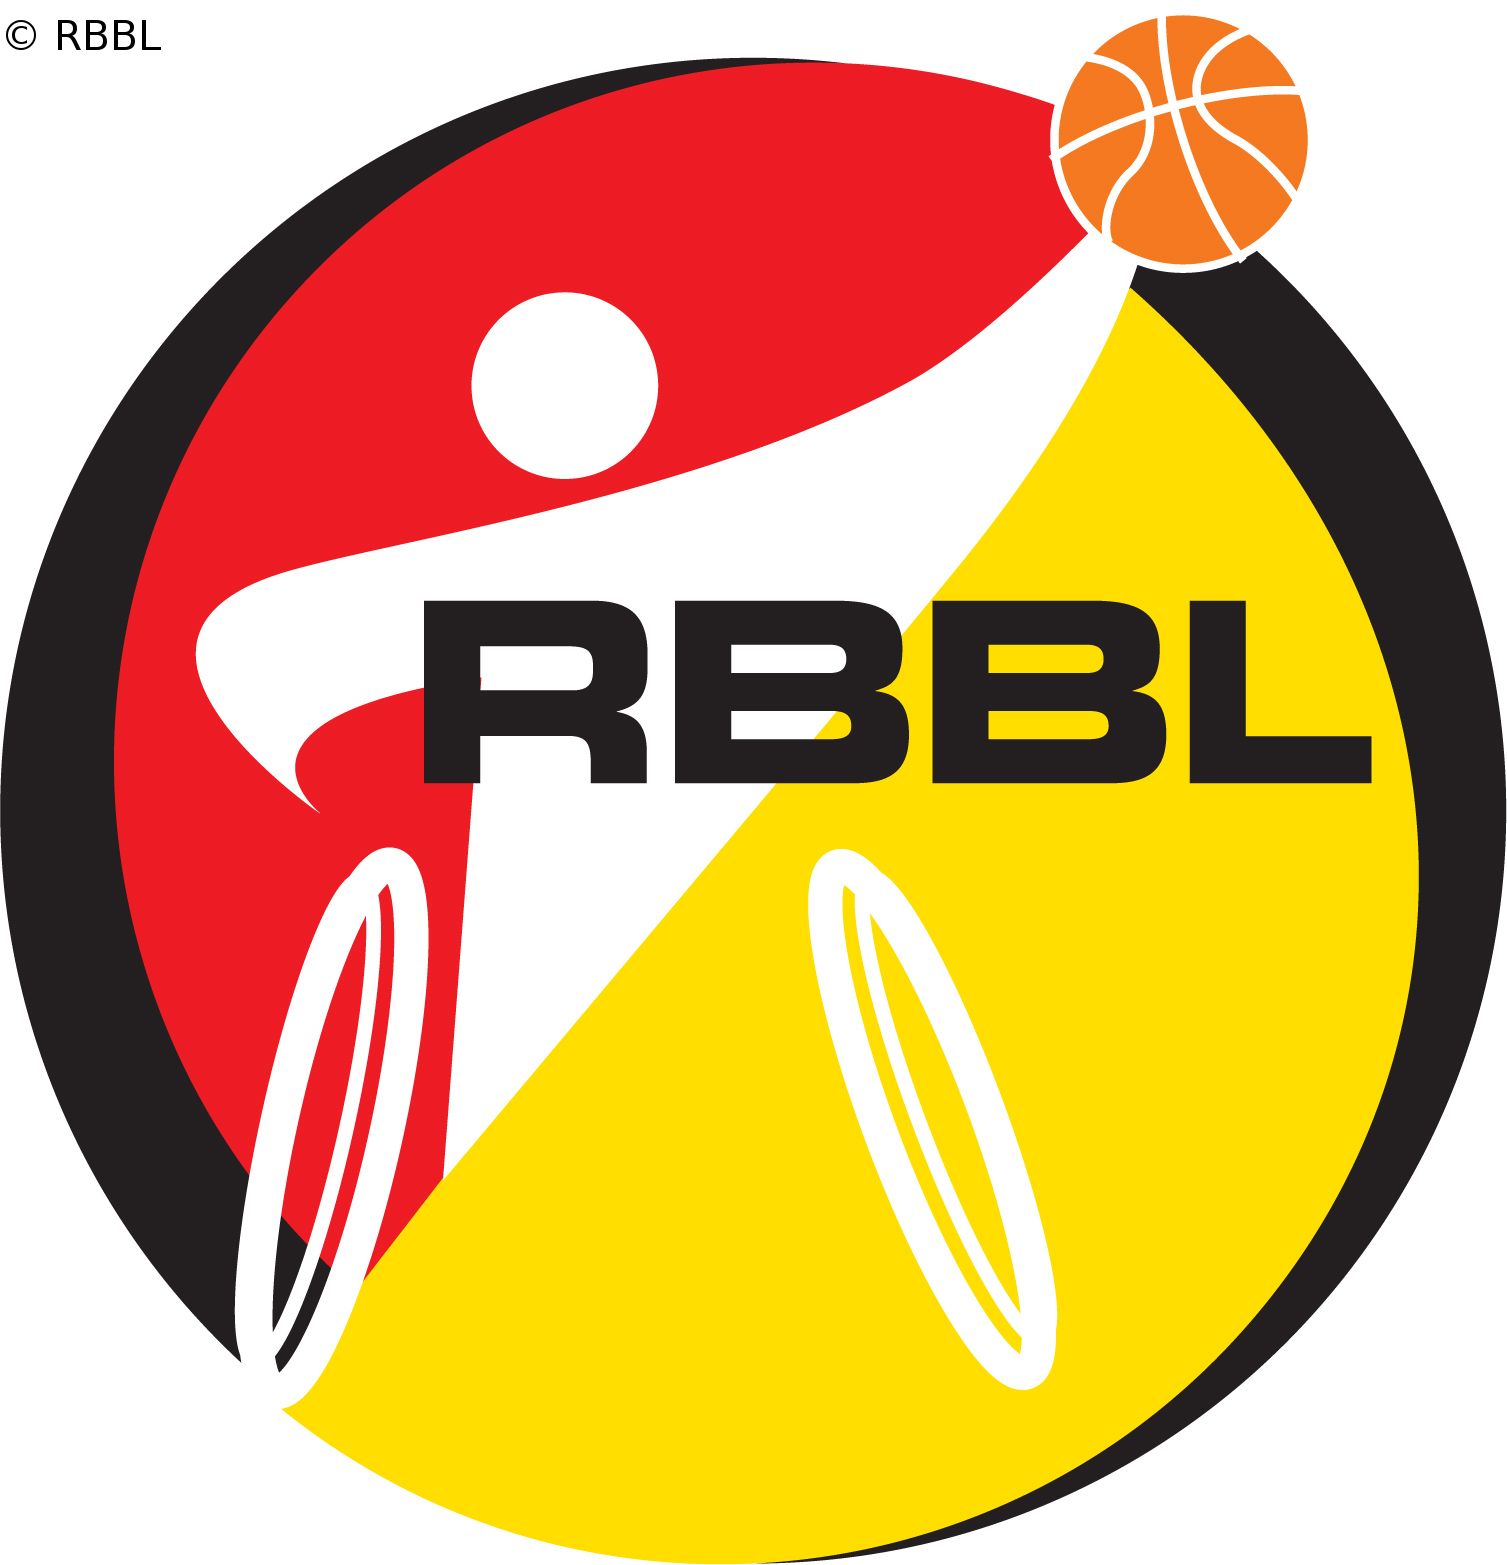 Corona-Fall in der RBBL sorgt für Spielabsage